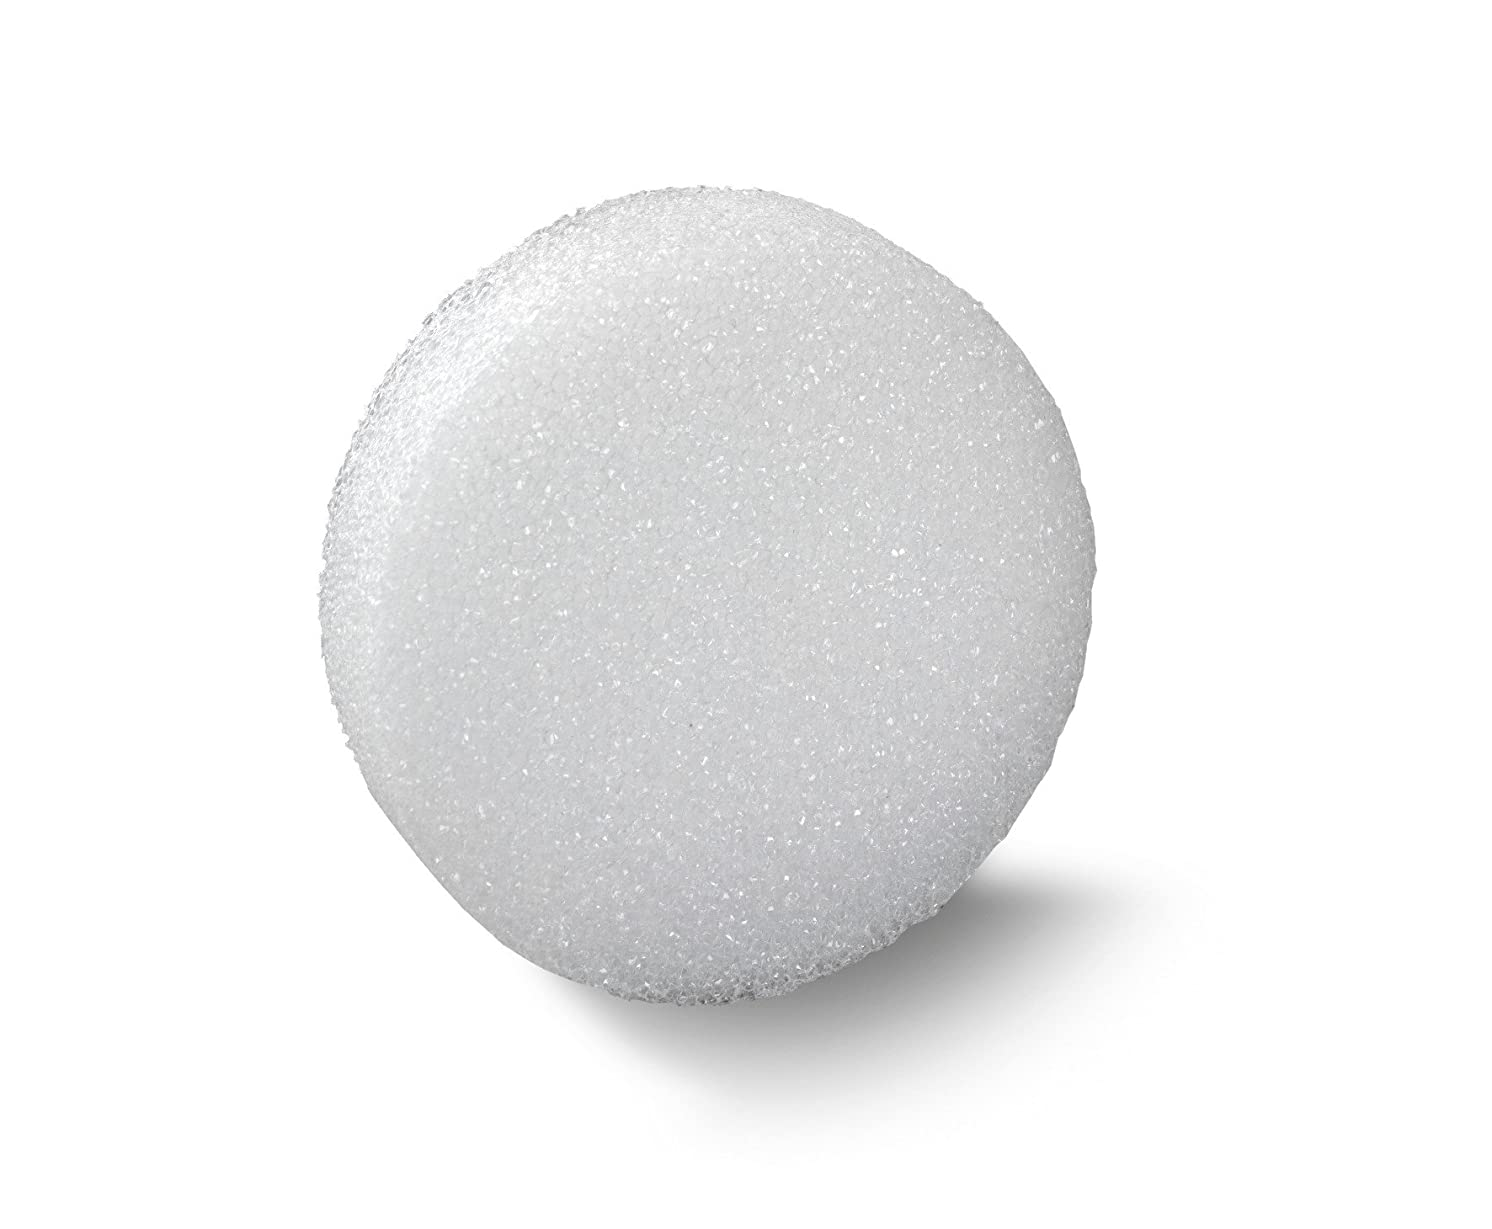 FloraCraft Styrofoam Disc 1.1 Inch x 8.8 Inch White